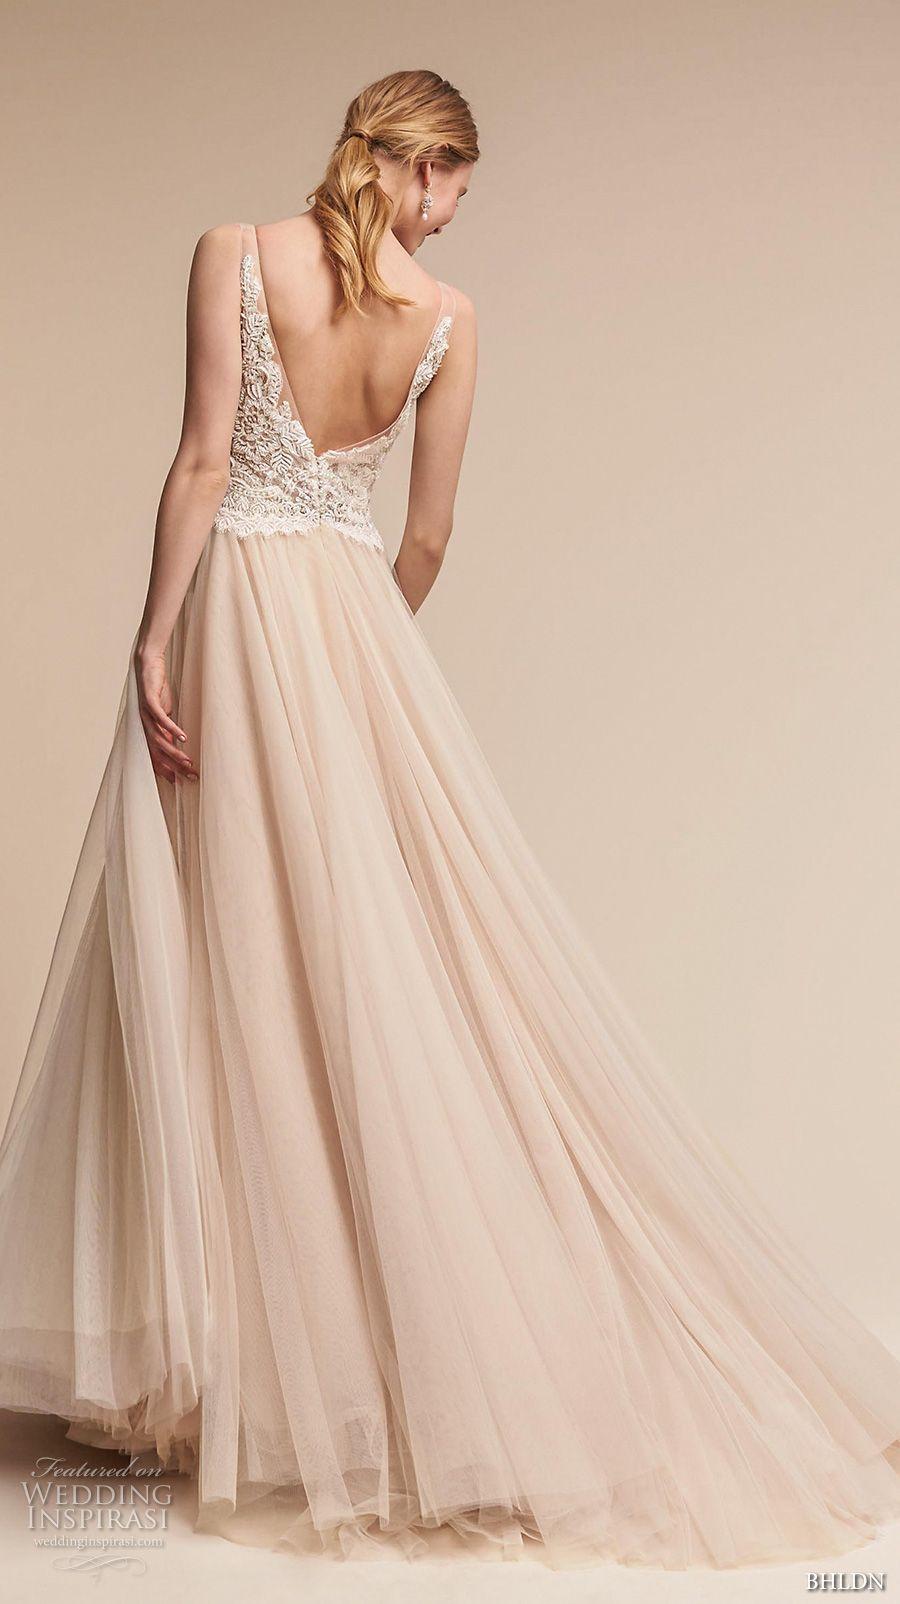 Bhldnus neobohemian wedding dresses u ucoasisud bridal